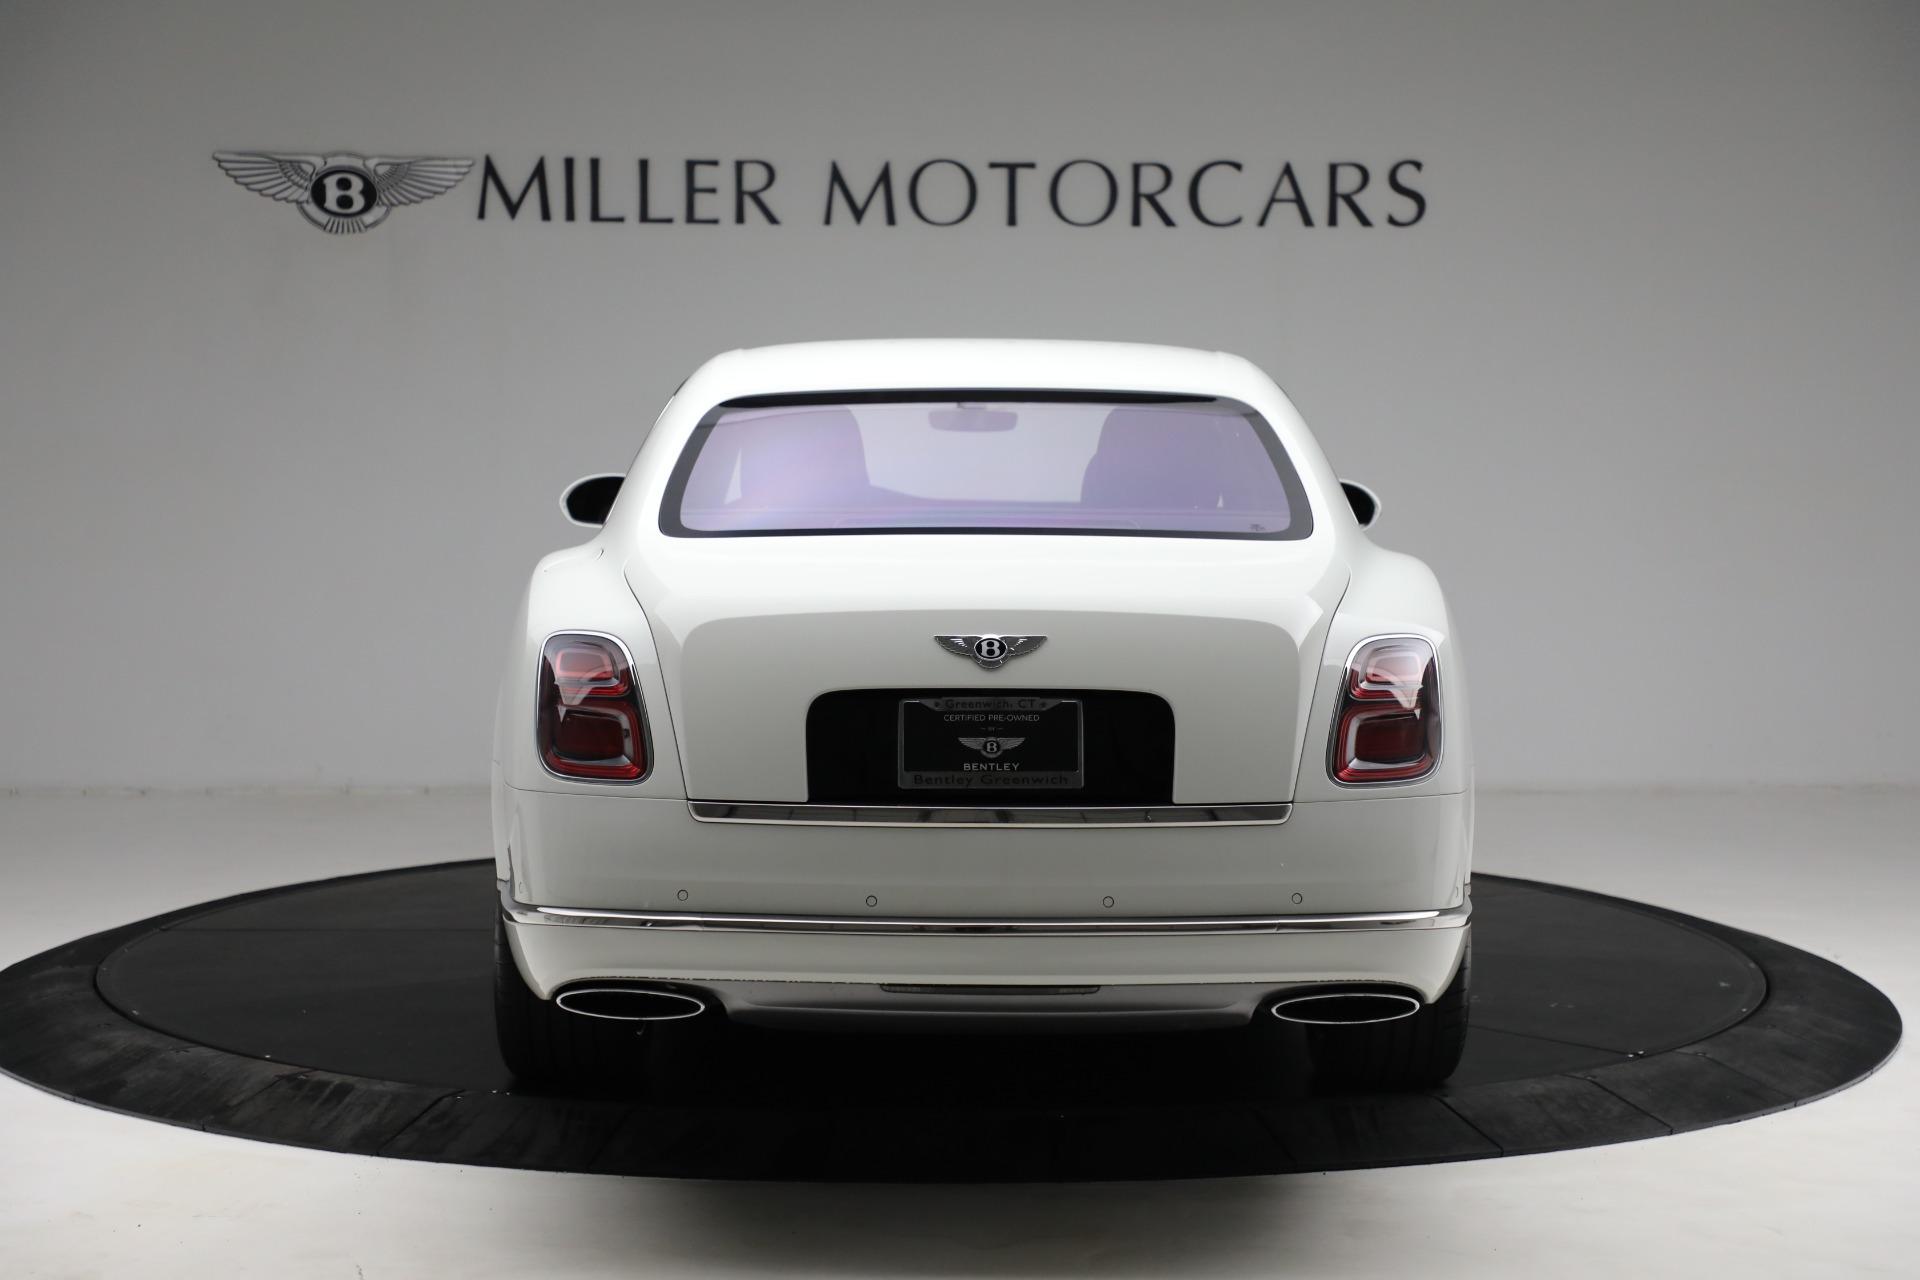 Used 2018 Bentley Mulsanne Speed For Sale In Westport, CT 2075_p5